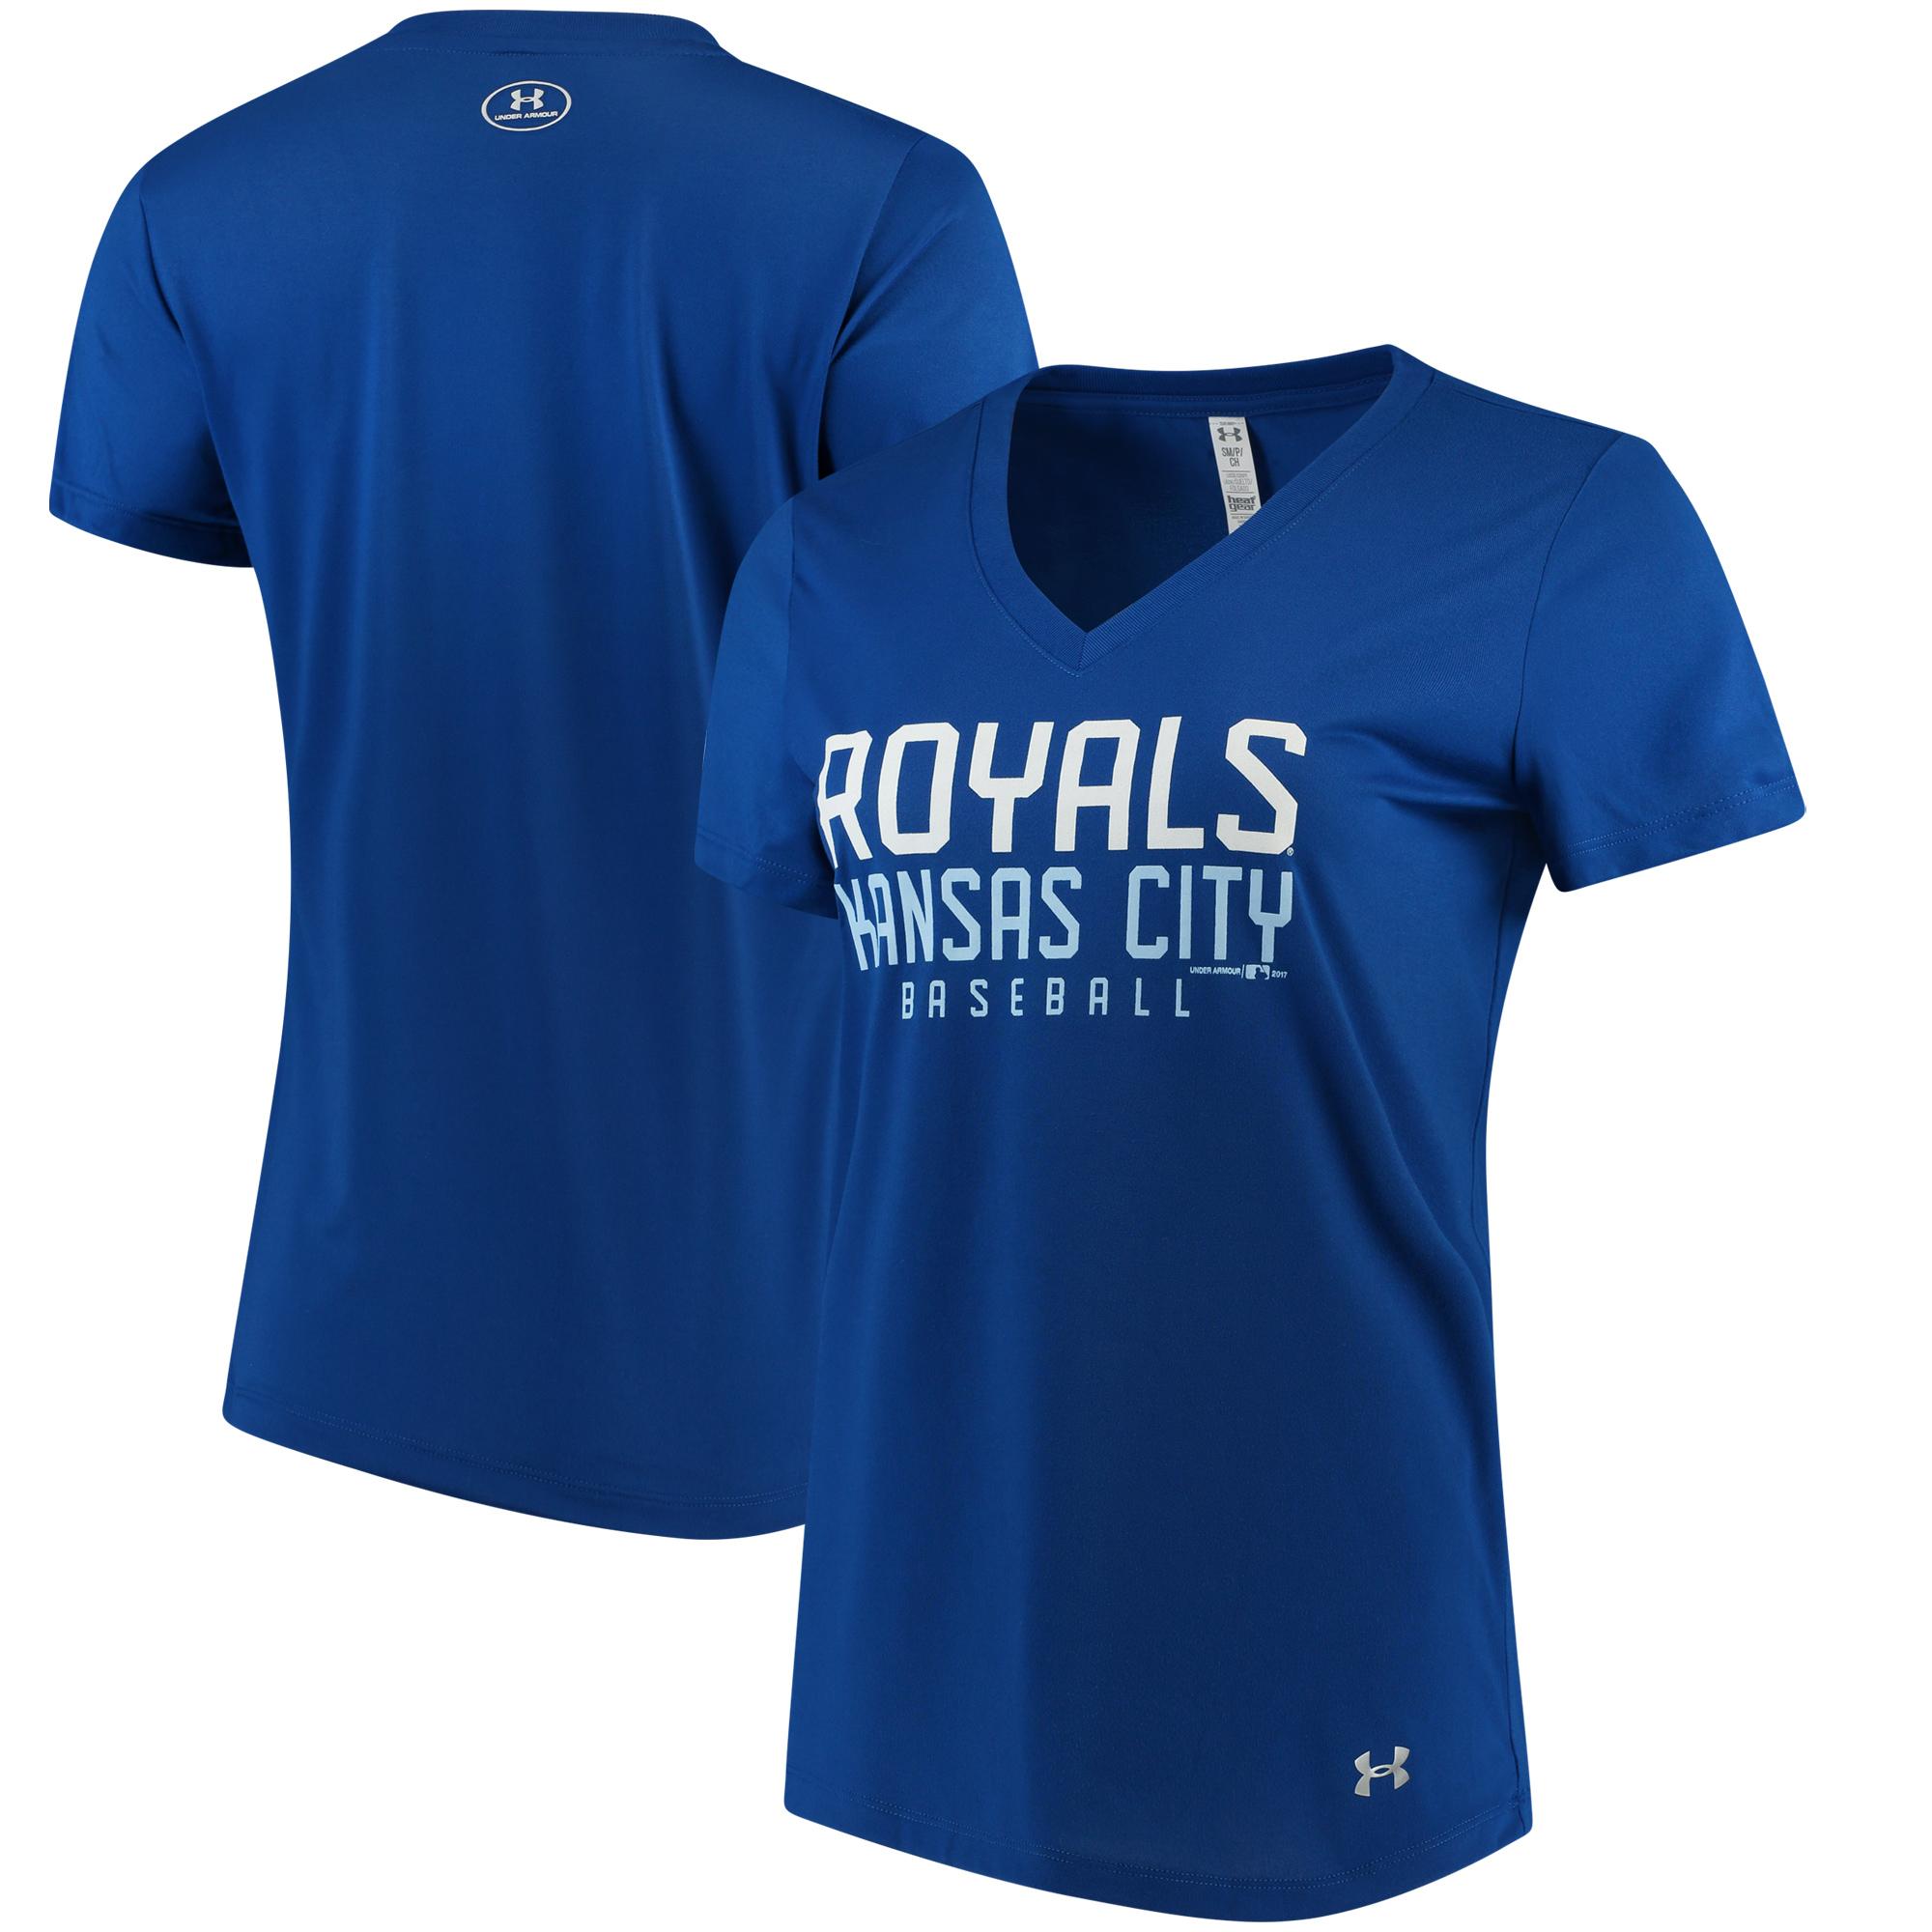 Kansas City Royals Under Armour Women's Tech Performance V-Neck T-Shirt - Royal